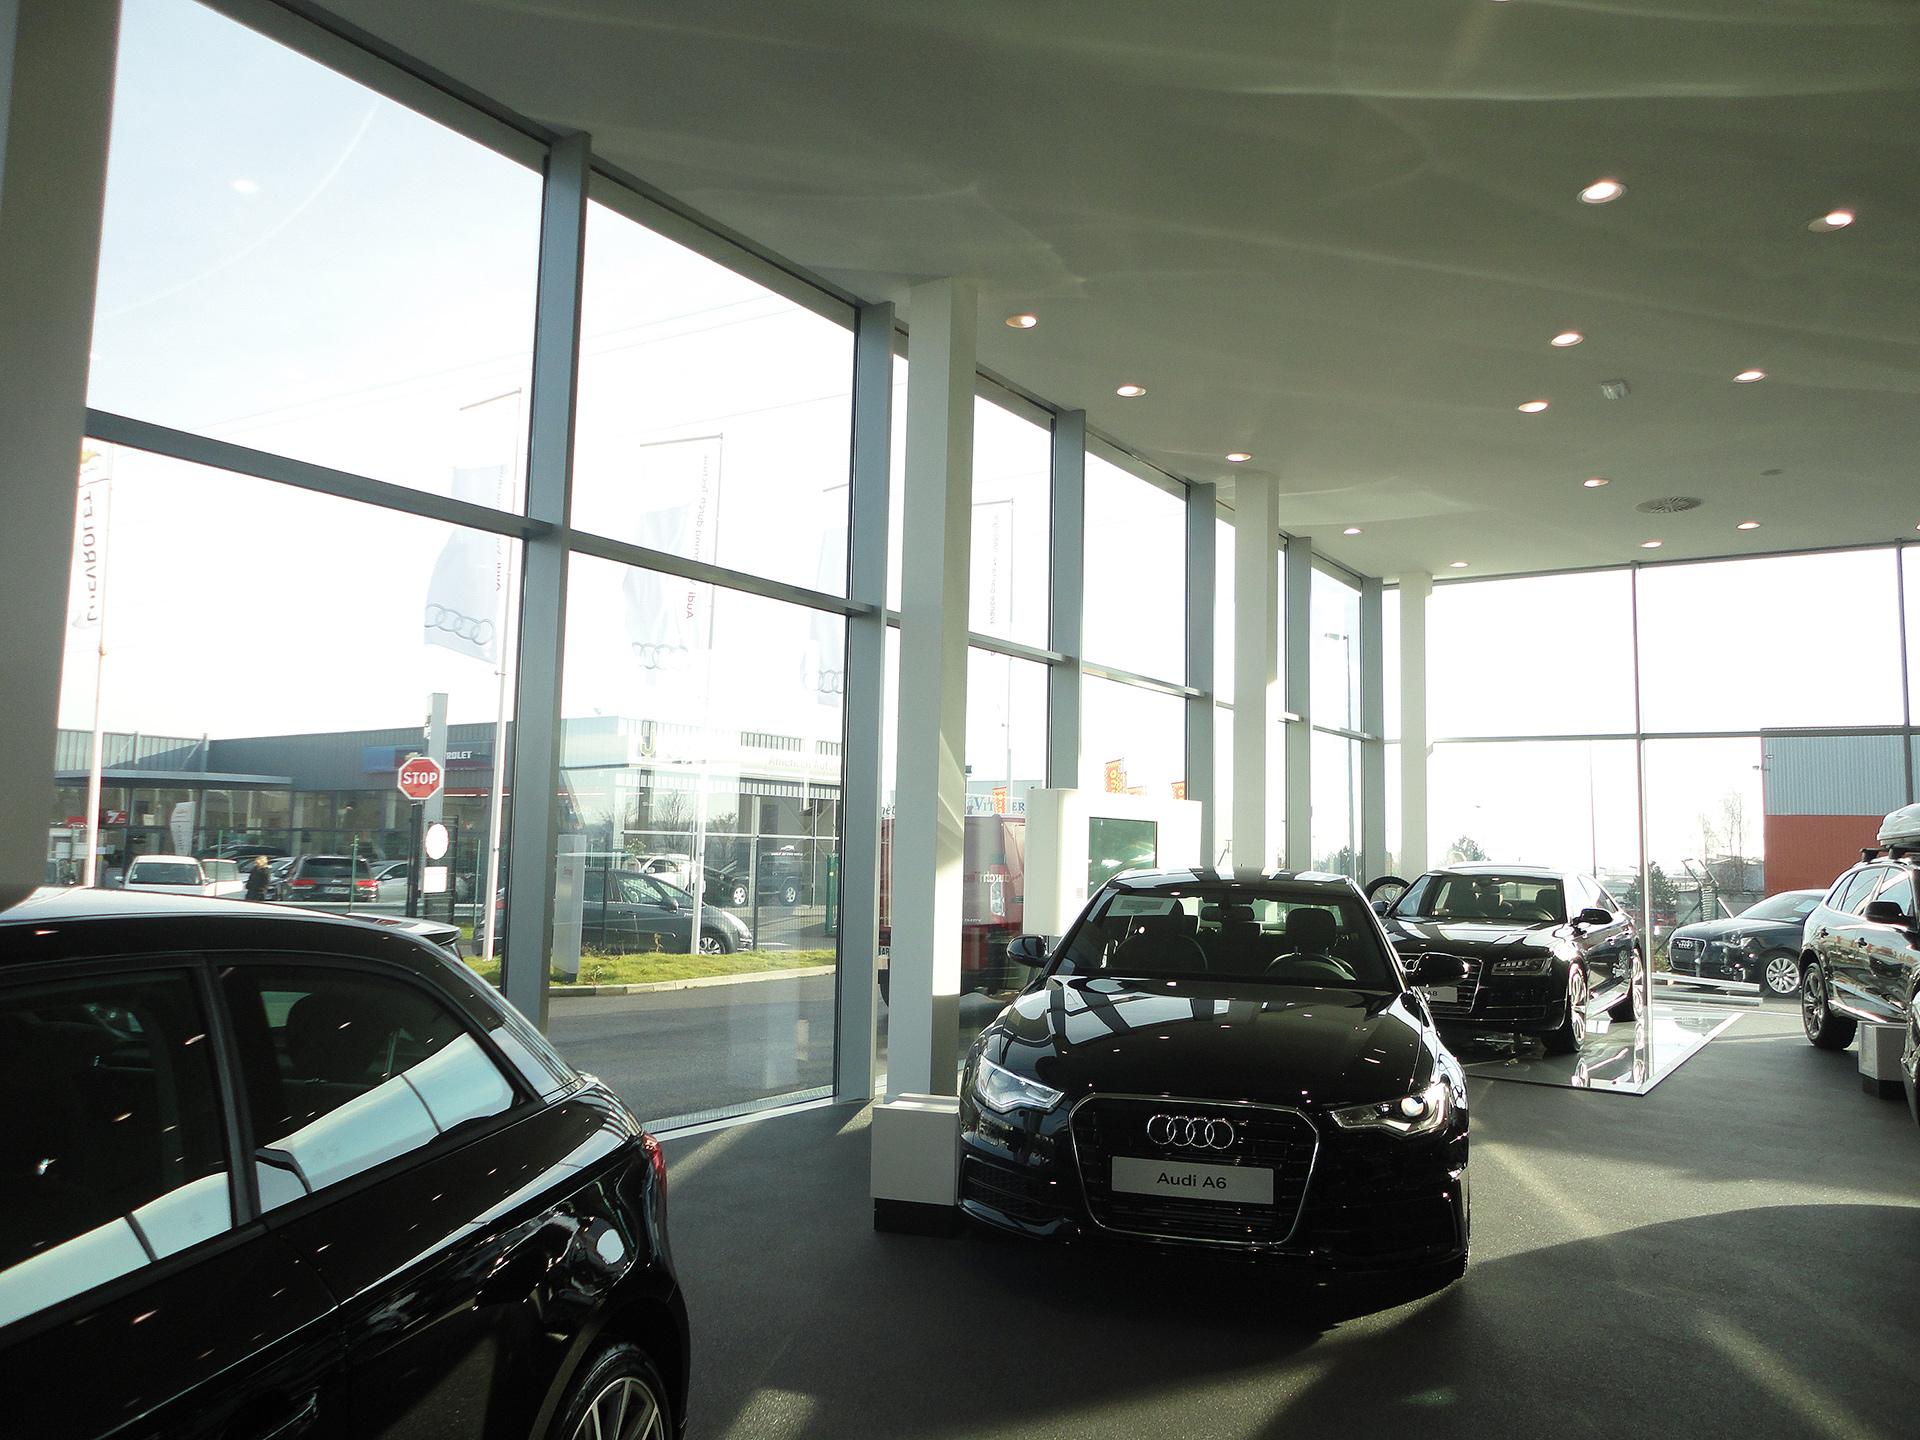 Audi Jaux